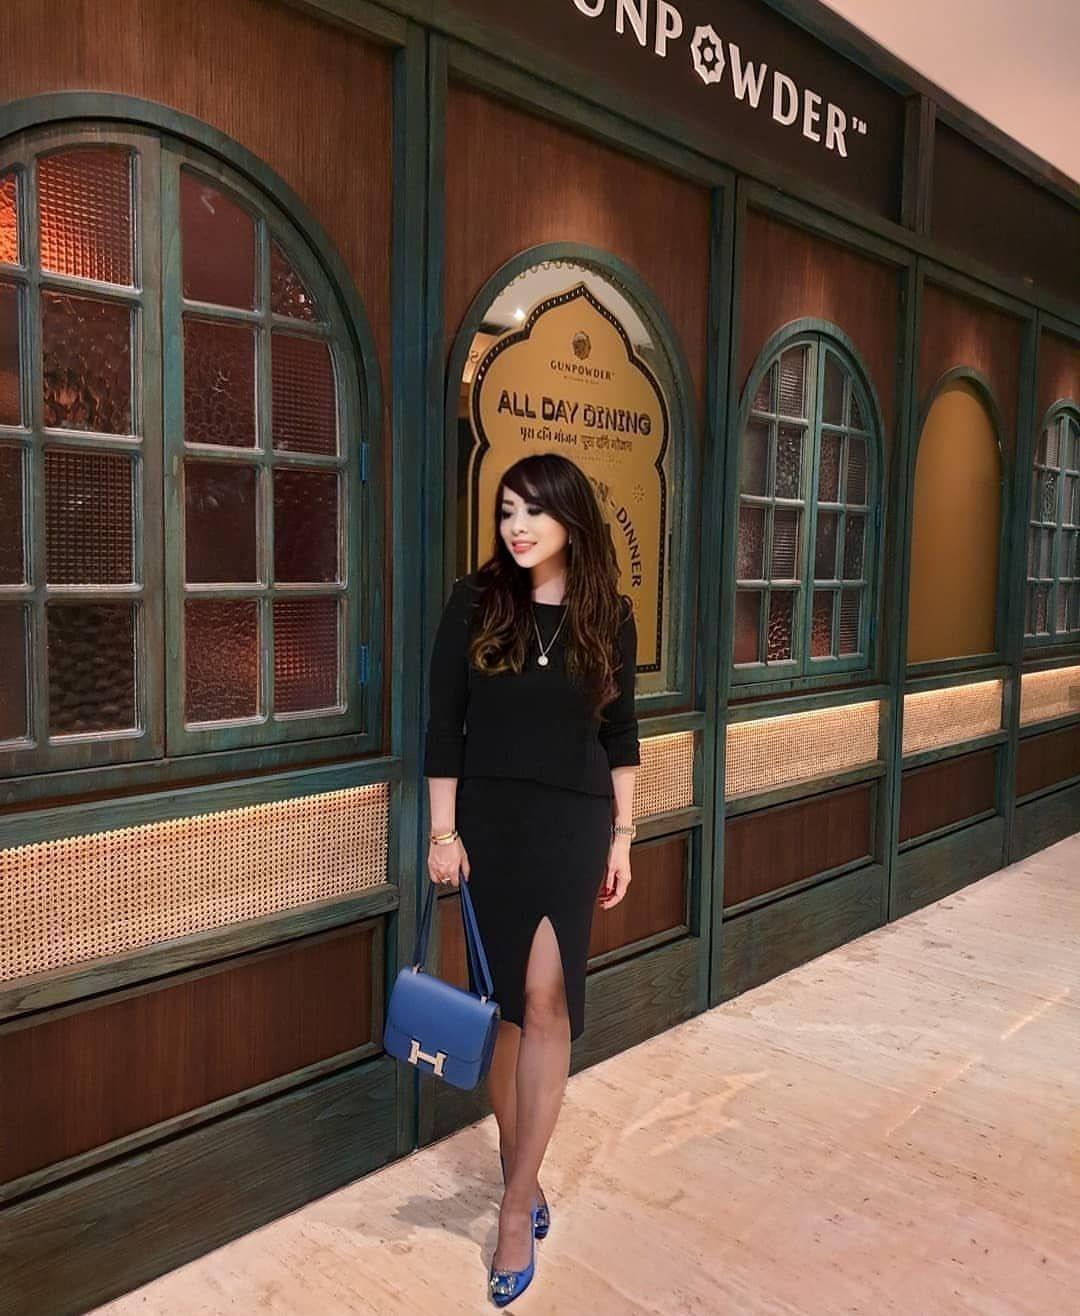 "Vee on Instagram: ""#luxury #highheels  #followme #photooftheday #legs #closeup #instafashion #instaheels #fashionshoes  #instashoes #highheelshoes  #walking…"""